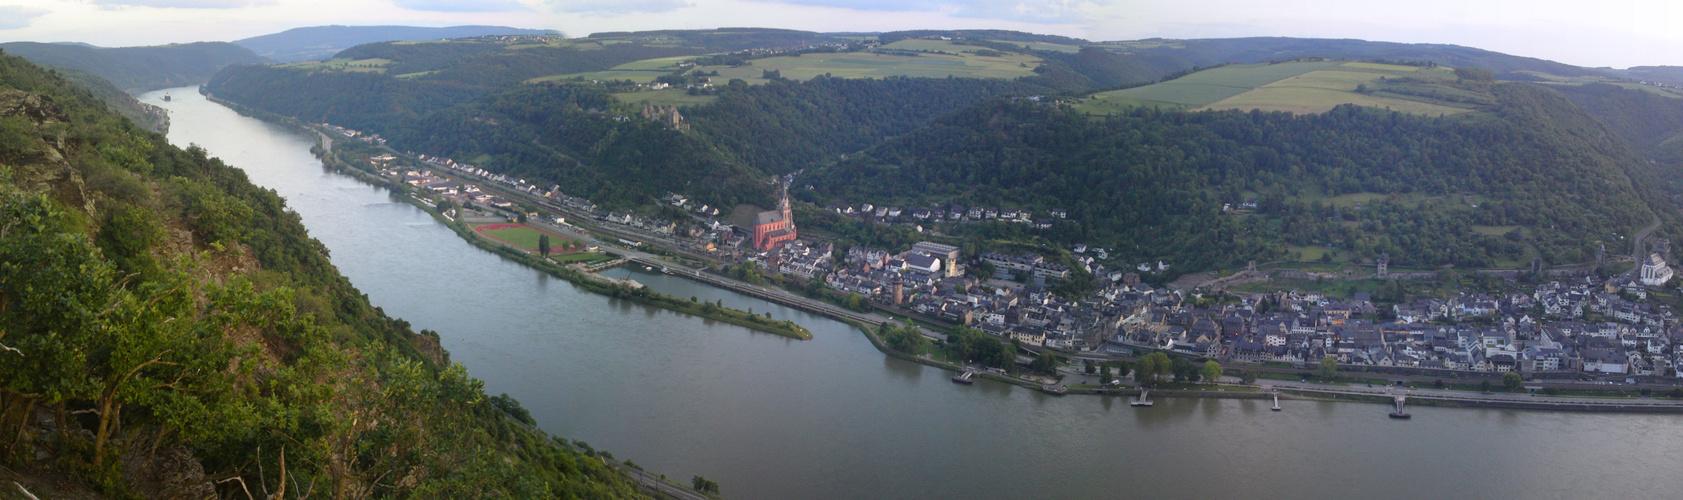 Mittelrheintal Kaub - Oberwesel